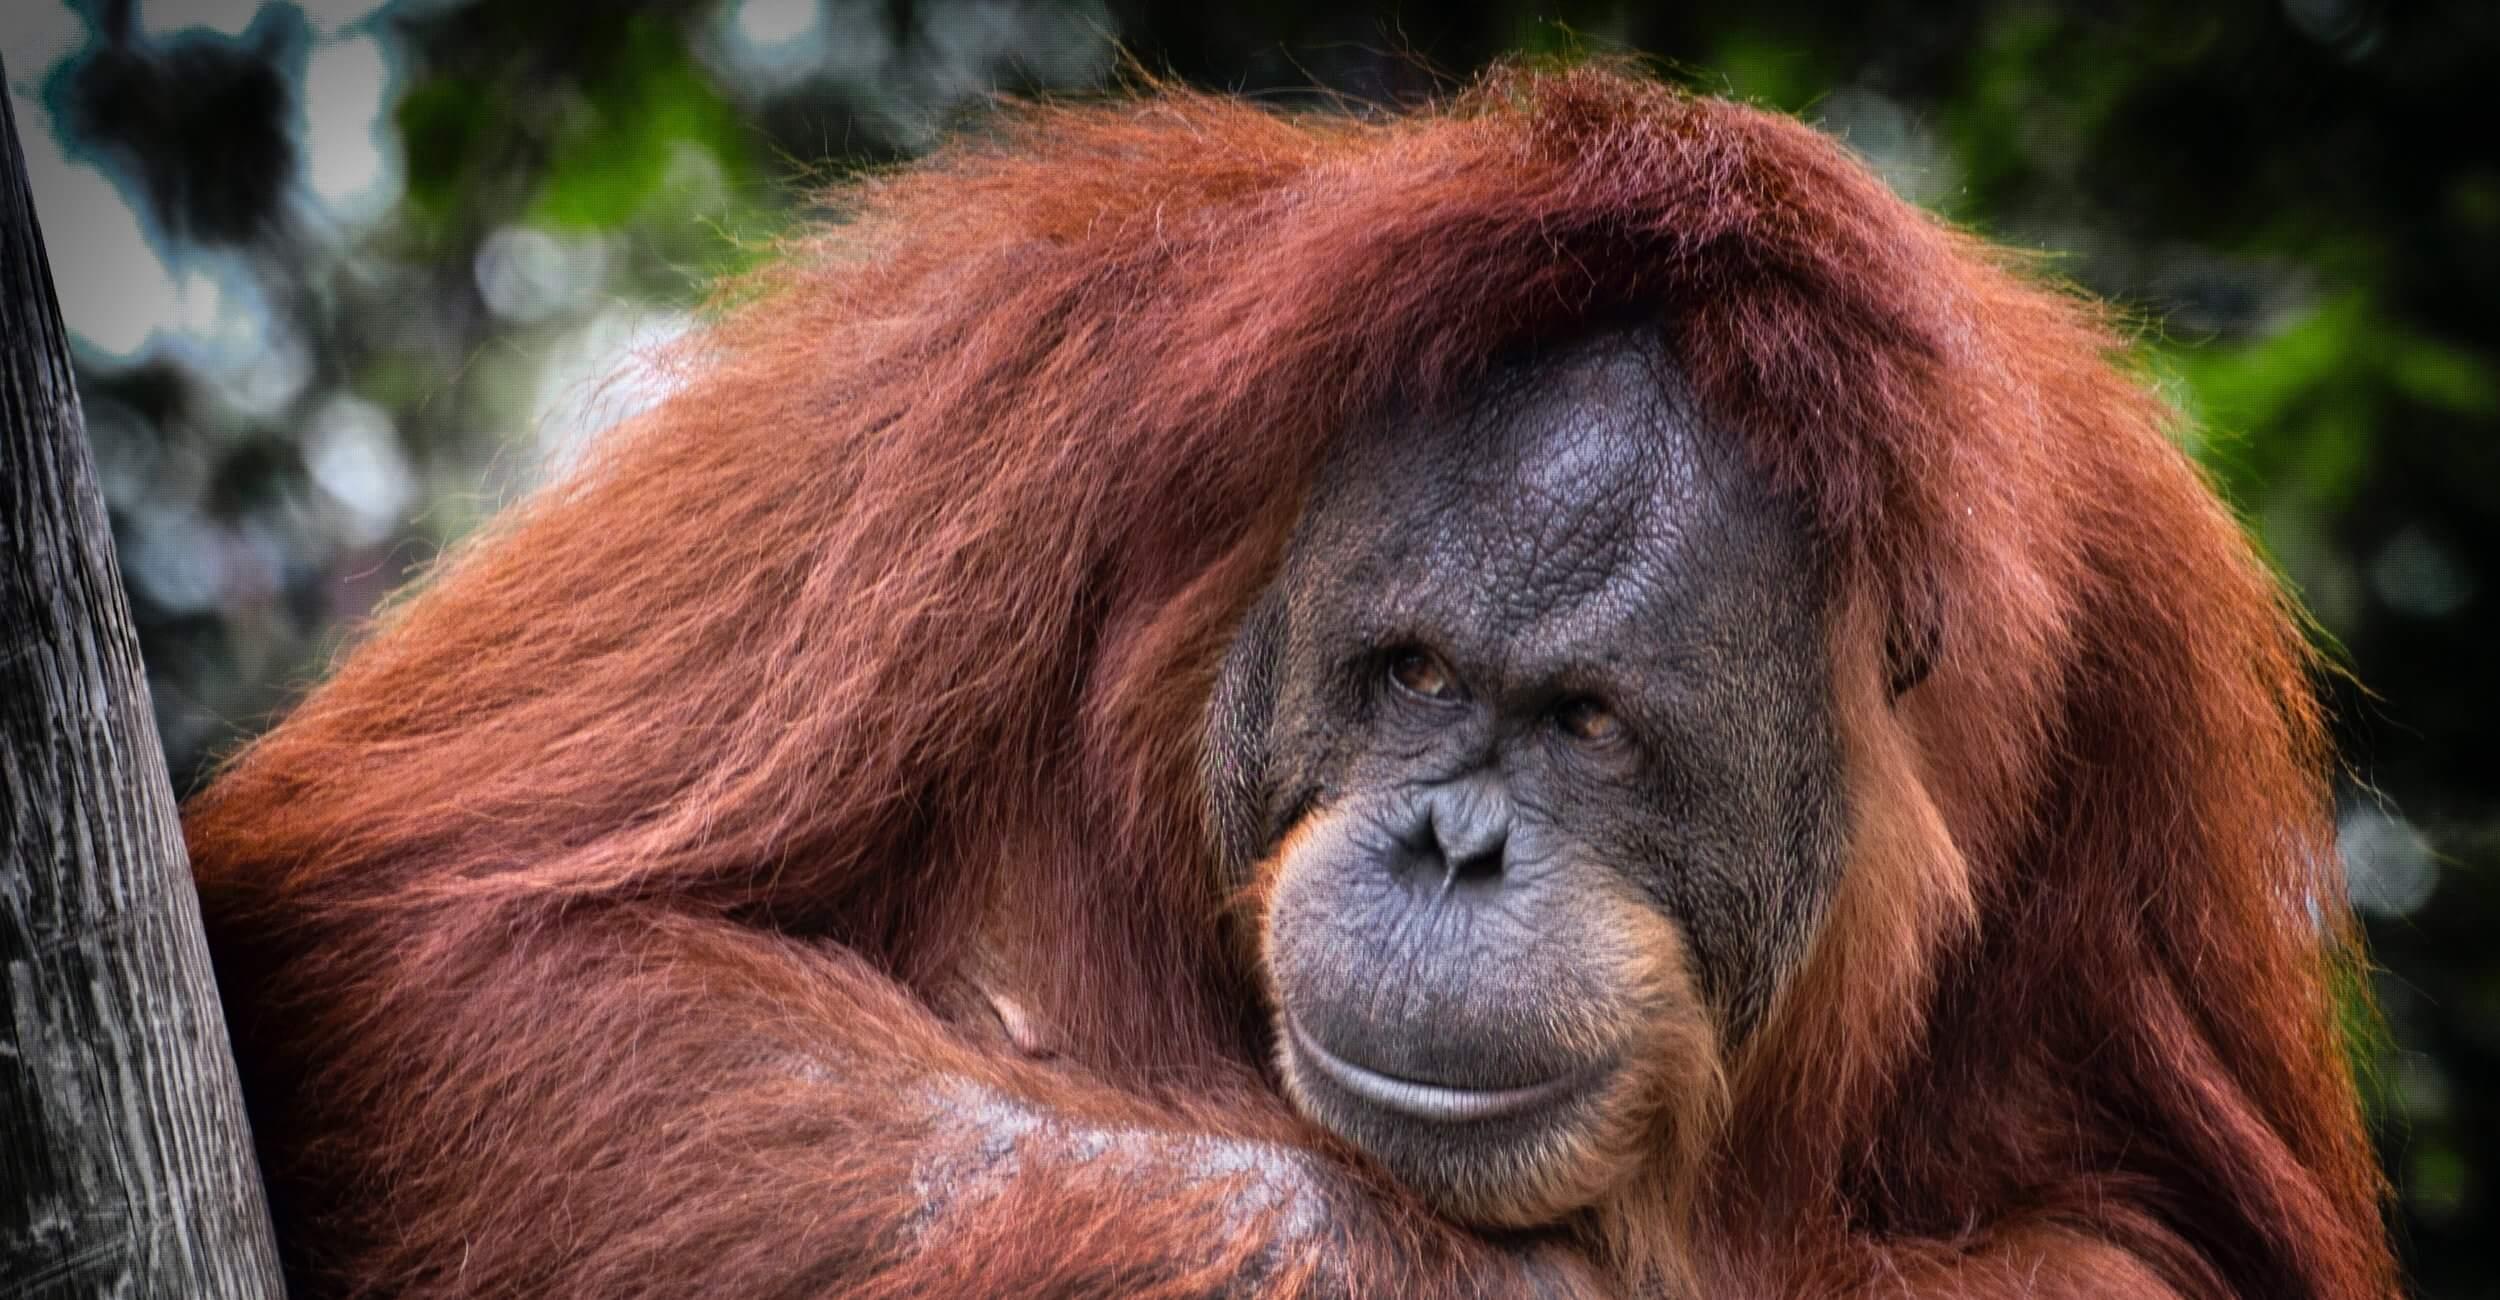 orangutang-breathe-portugal.jpg